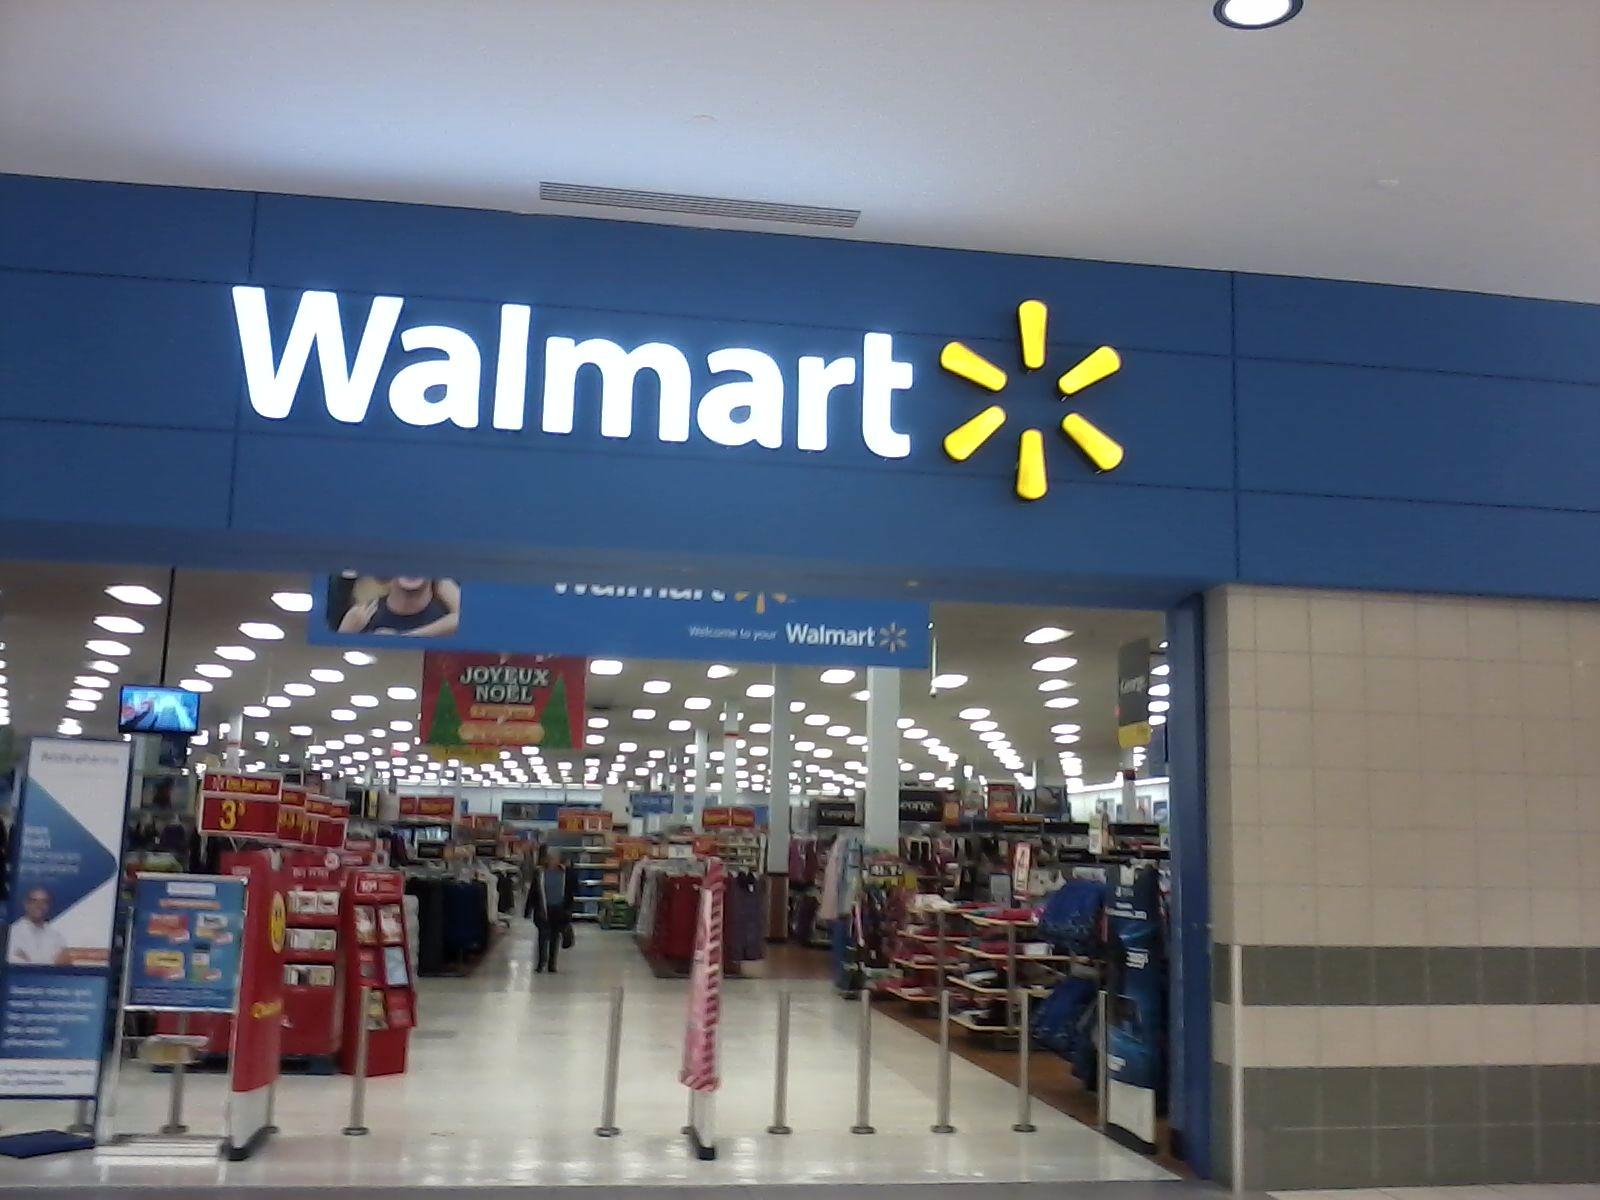 Walmart jumps ahead of Amazon with Scan & Go